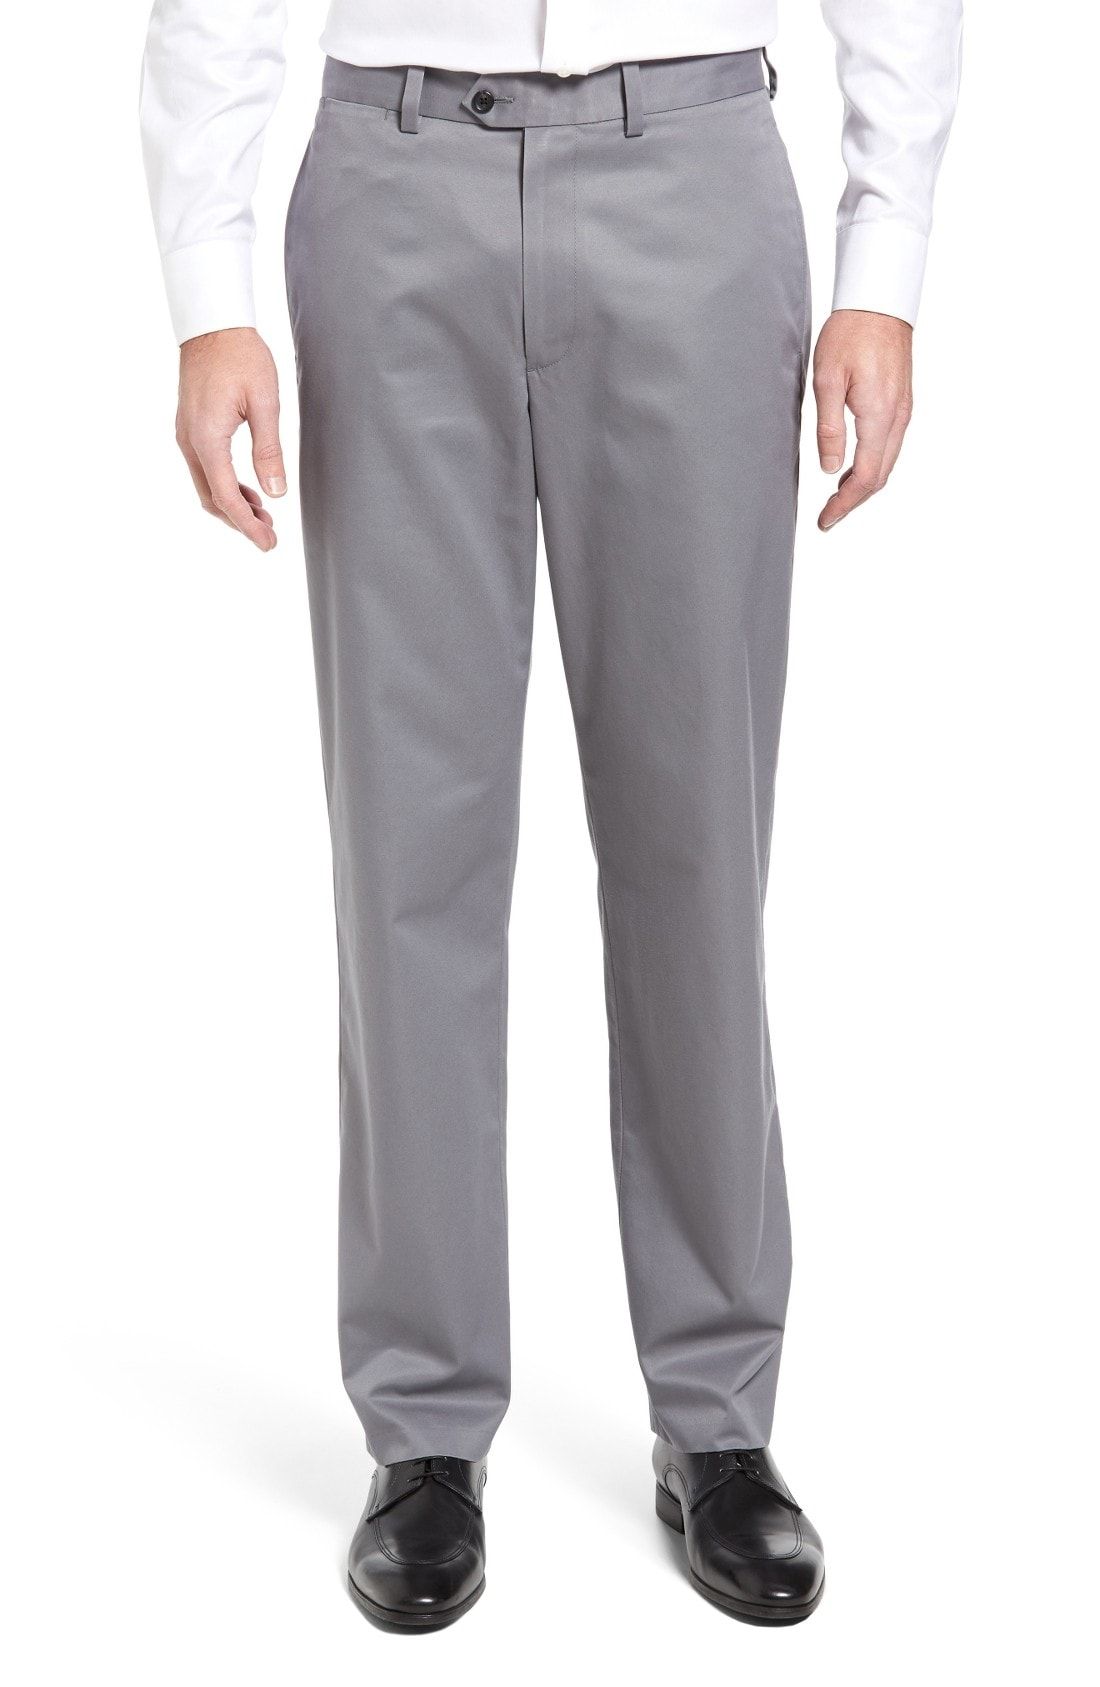 Nordstrom Men's Shop Smartcare Classic Supima Cotton Flat Front Trousers (Online Only)